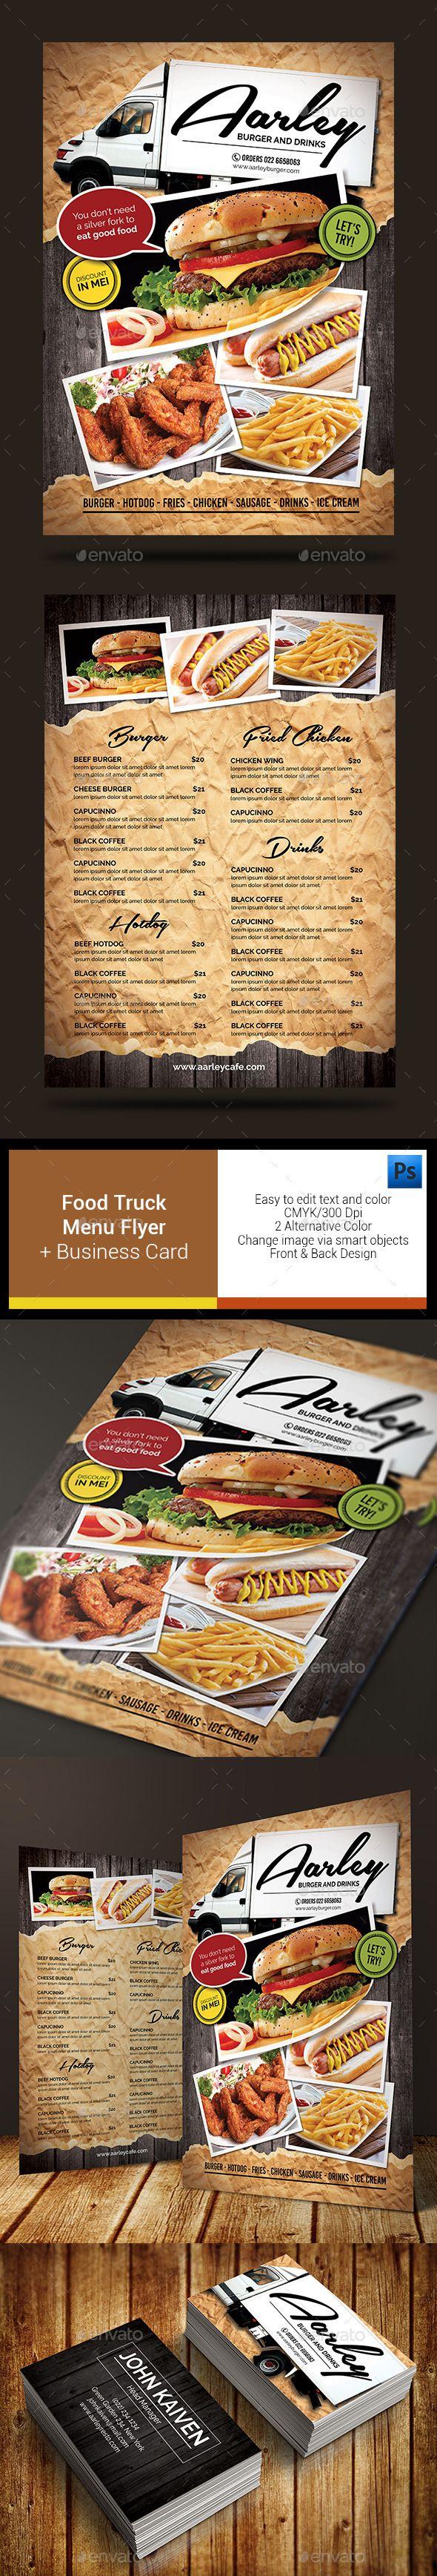 Menu Flyer Templates Yenimescaleco - Food truck flyer template